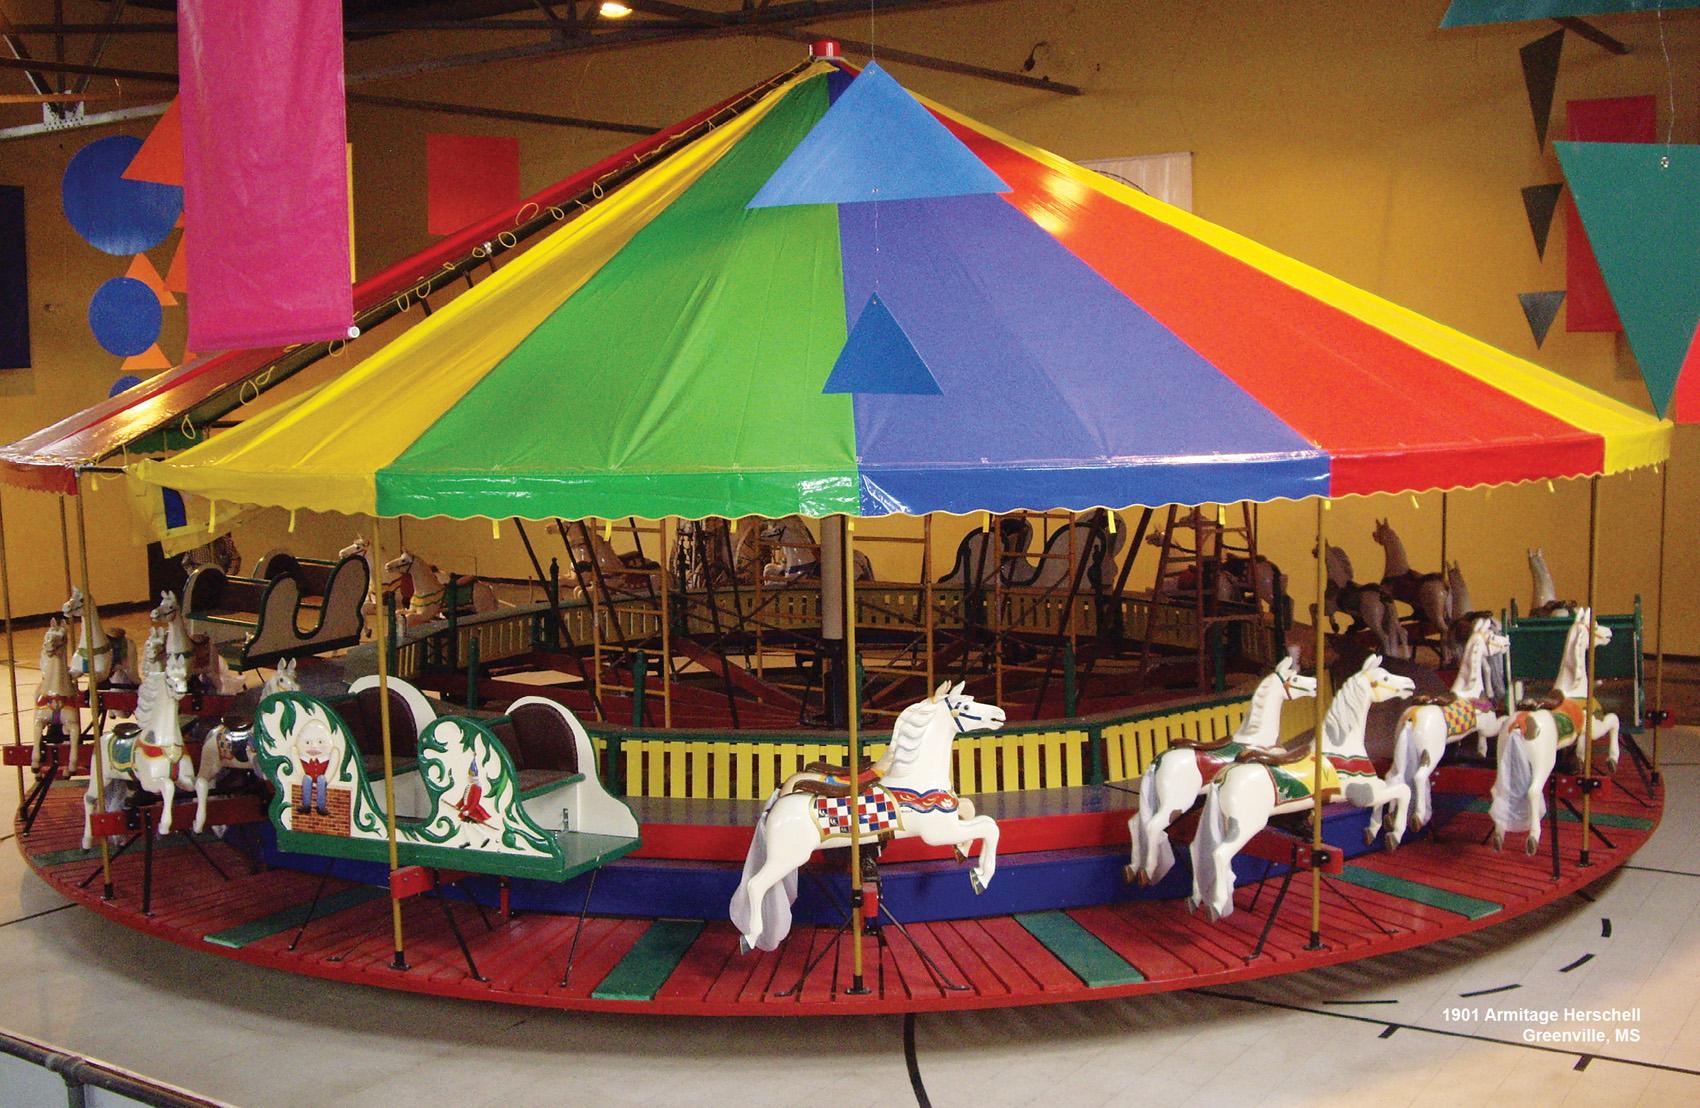 1901-Armitage-Herschell-carousel-Greenville-MS-CNT-center-Apr-07